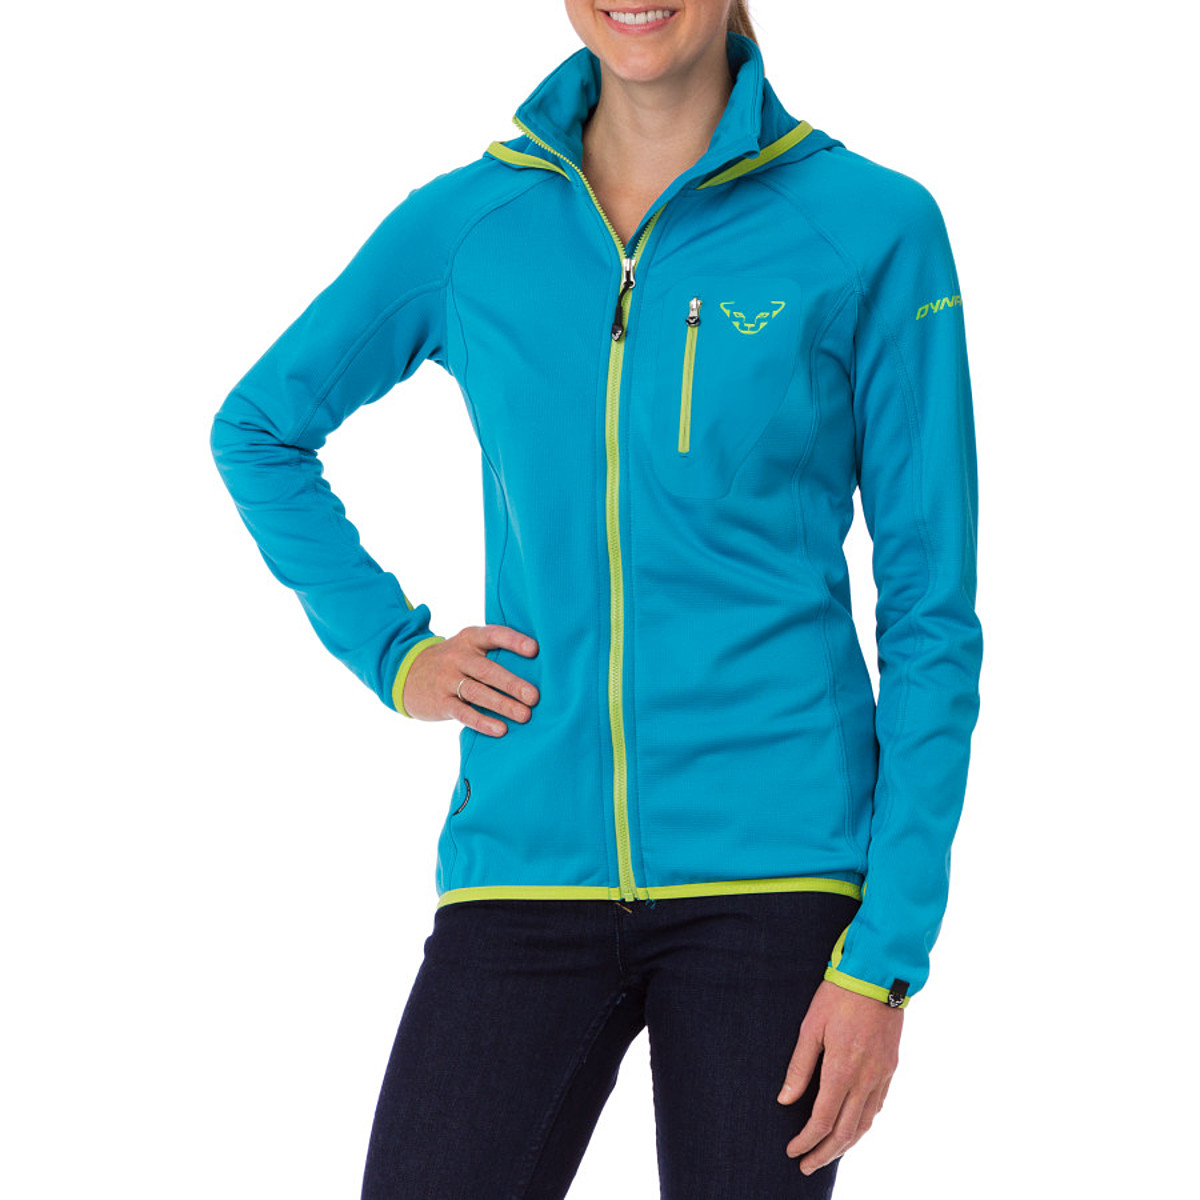 Dynafit Technostretch Thermal Layer Jacket